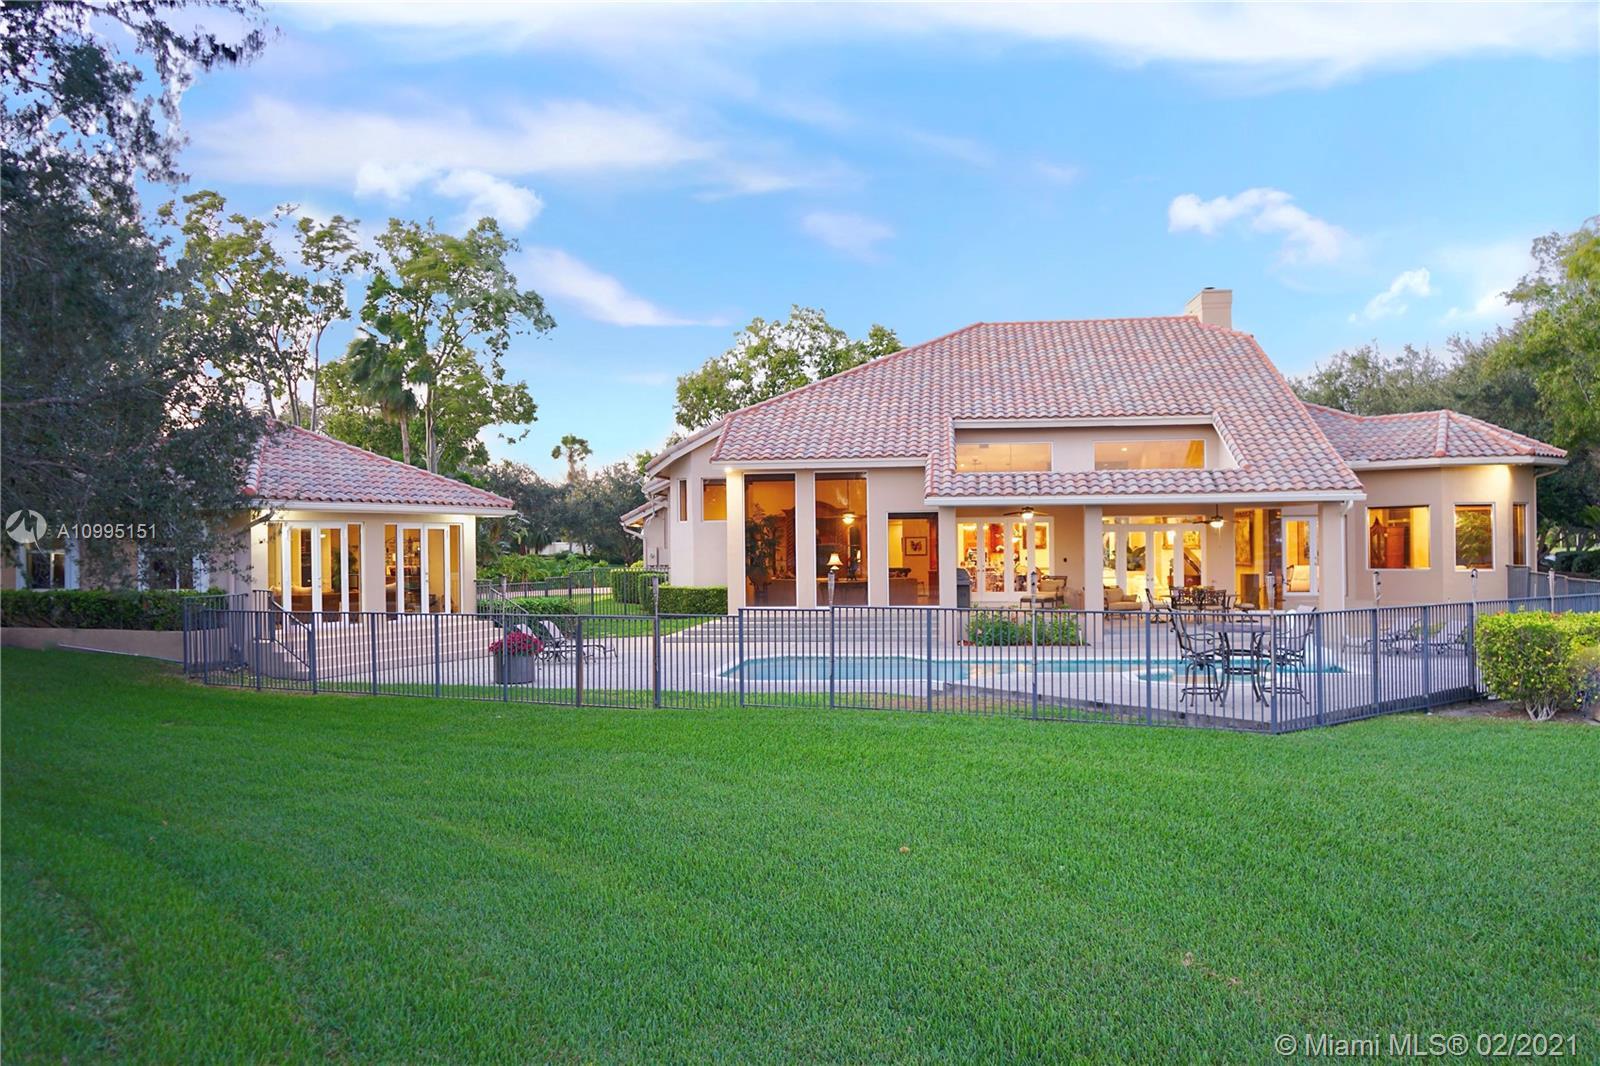 Windmill Ranch Estates, 3190 Willow Ln, Weston, Florida 33331